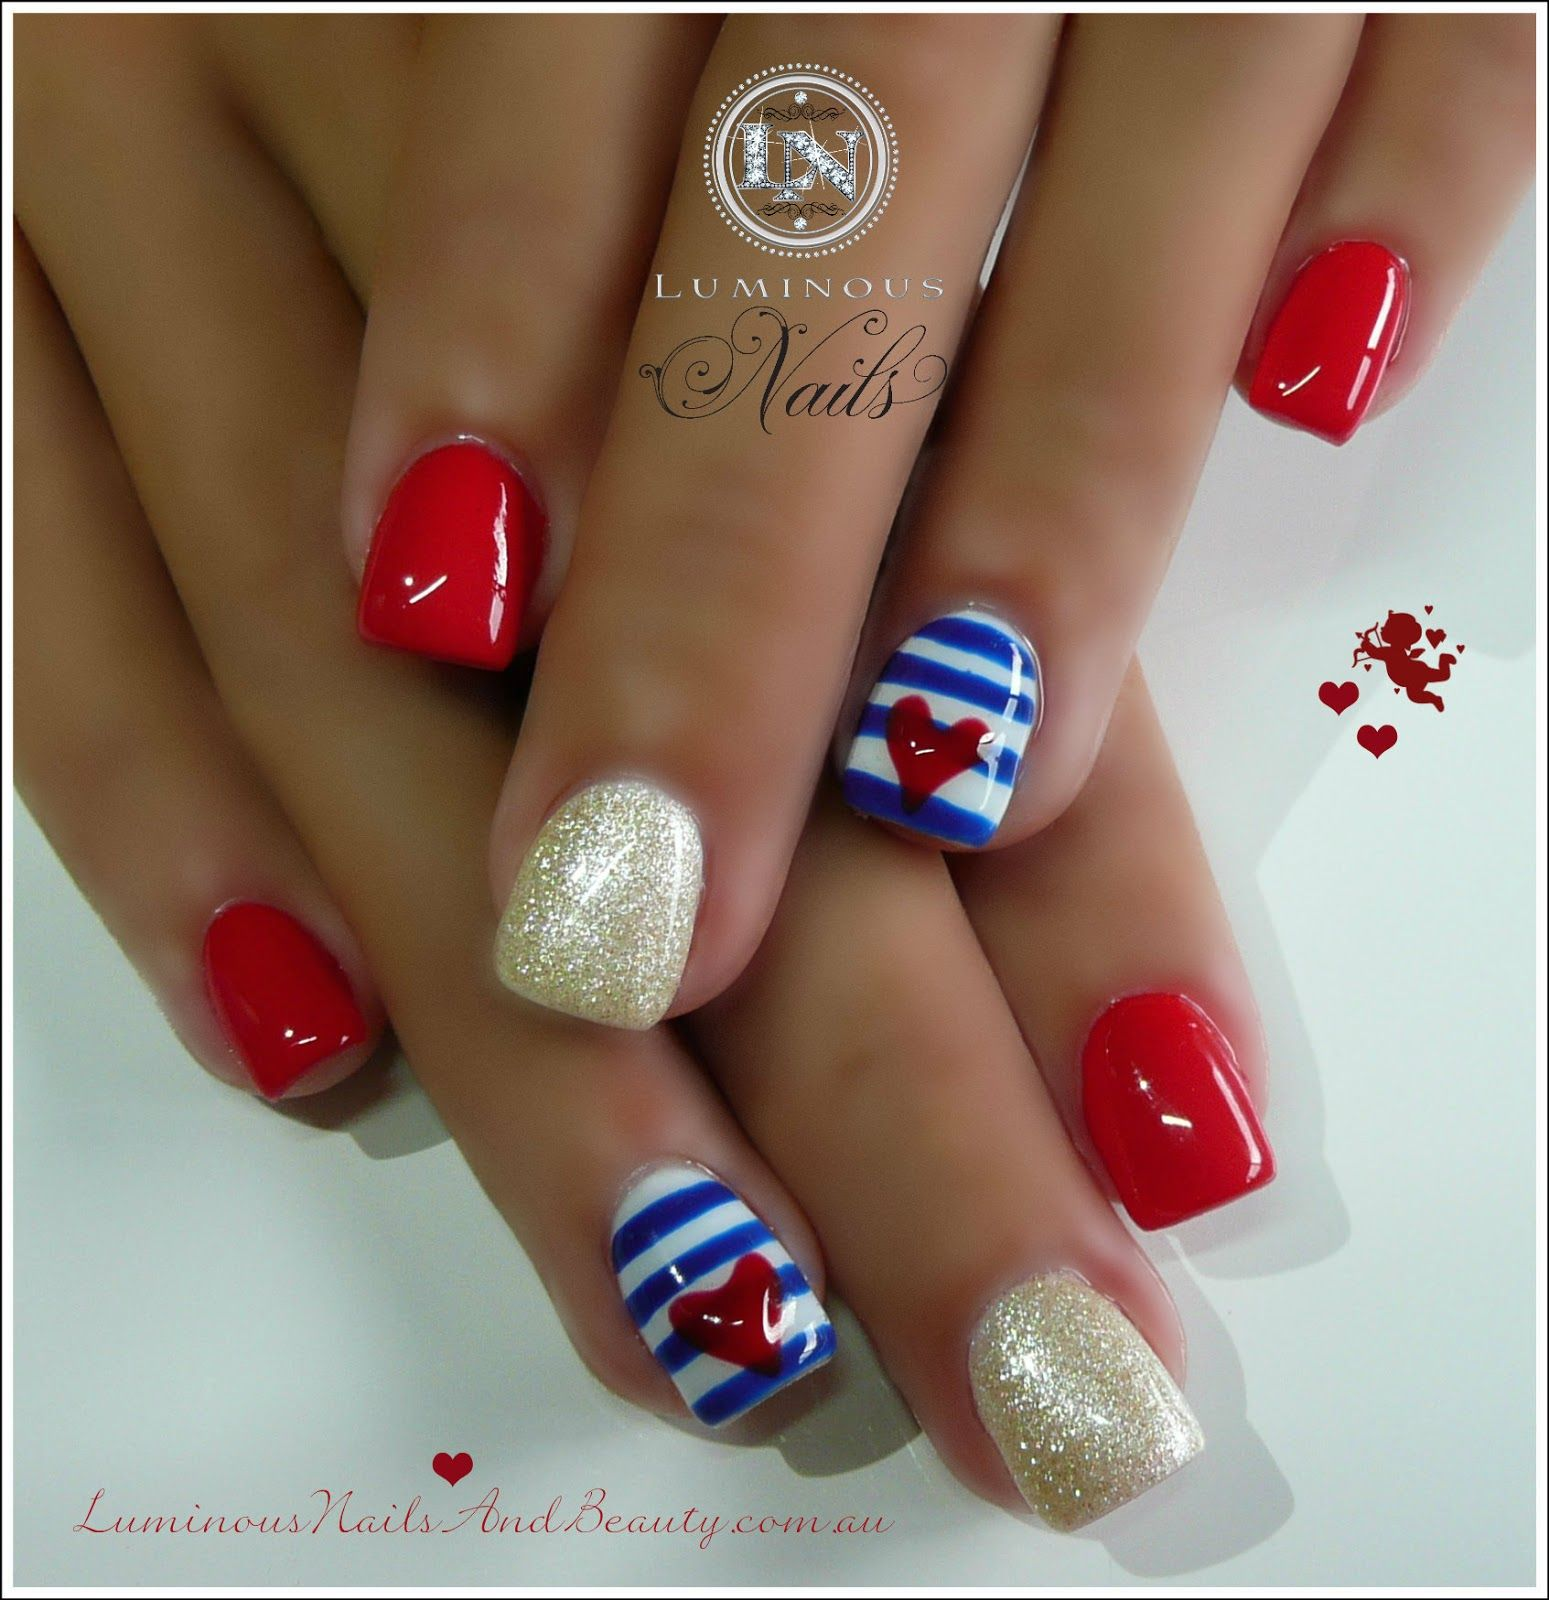 acrylic+nail+designs | acrylic nails 252 (fullsize → 1549 x 1600